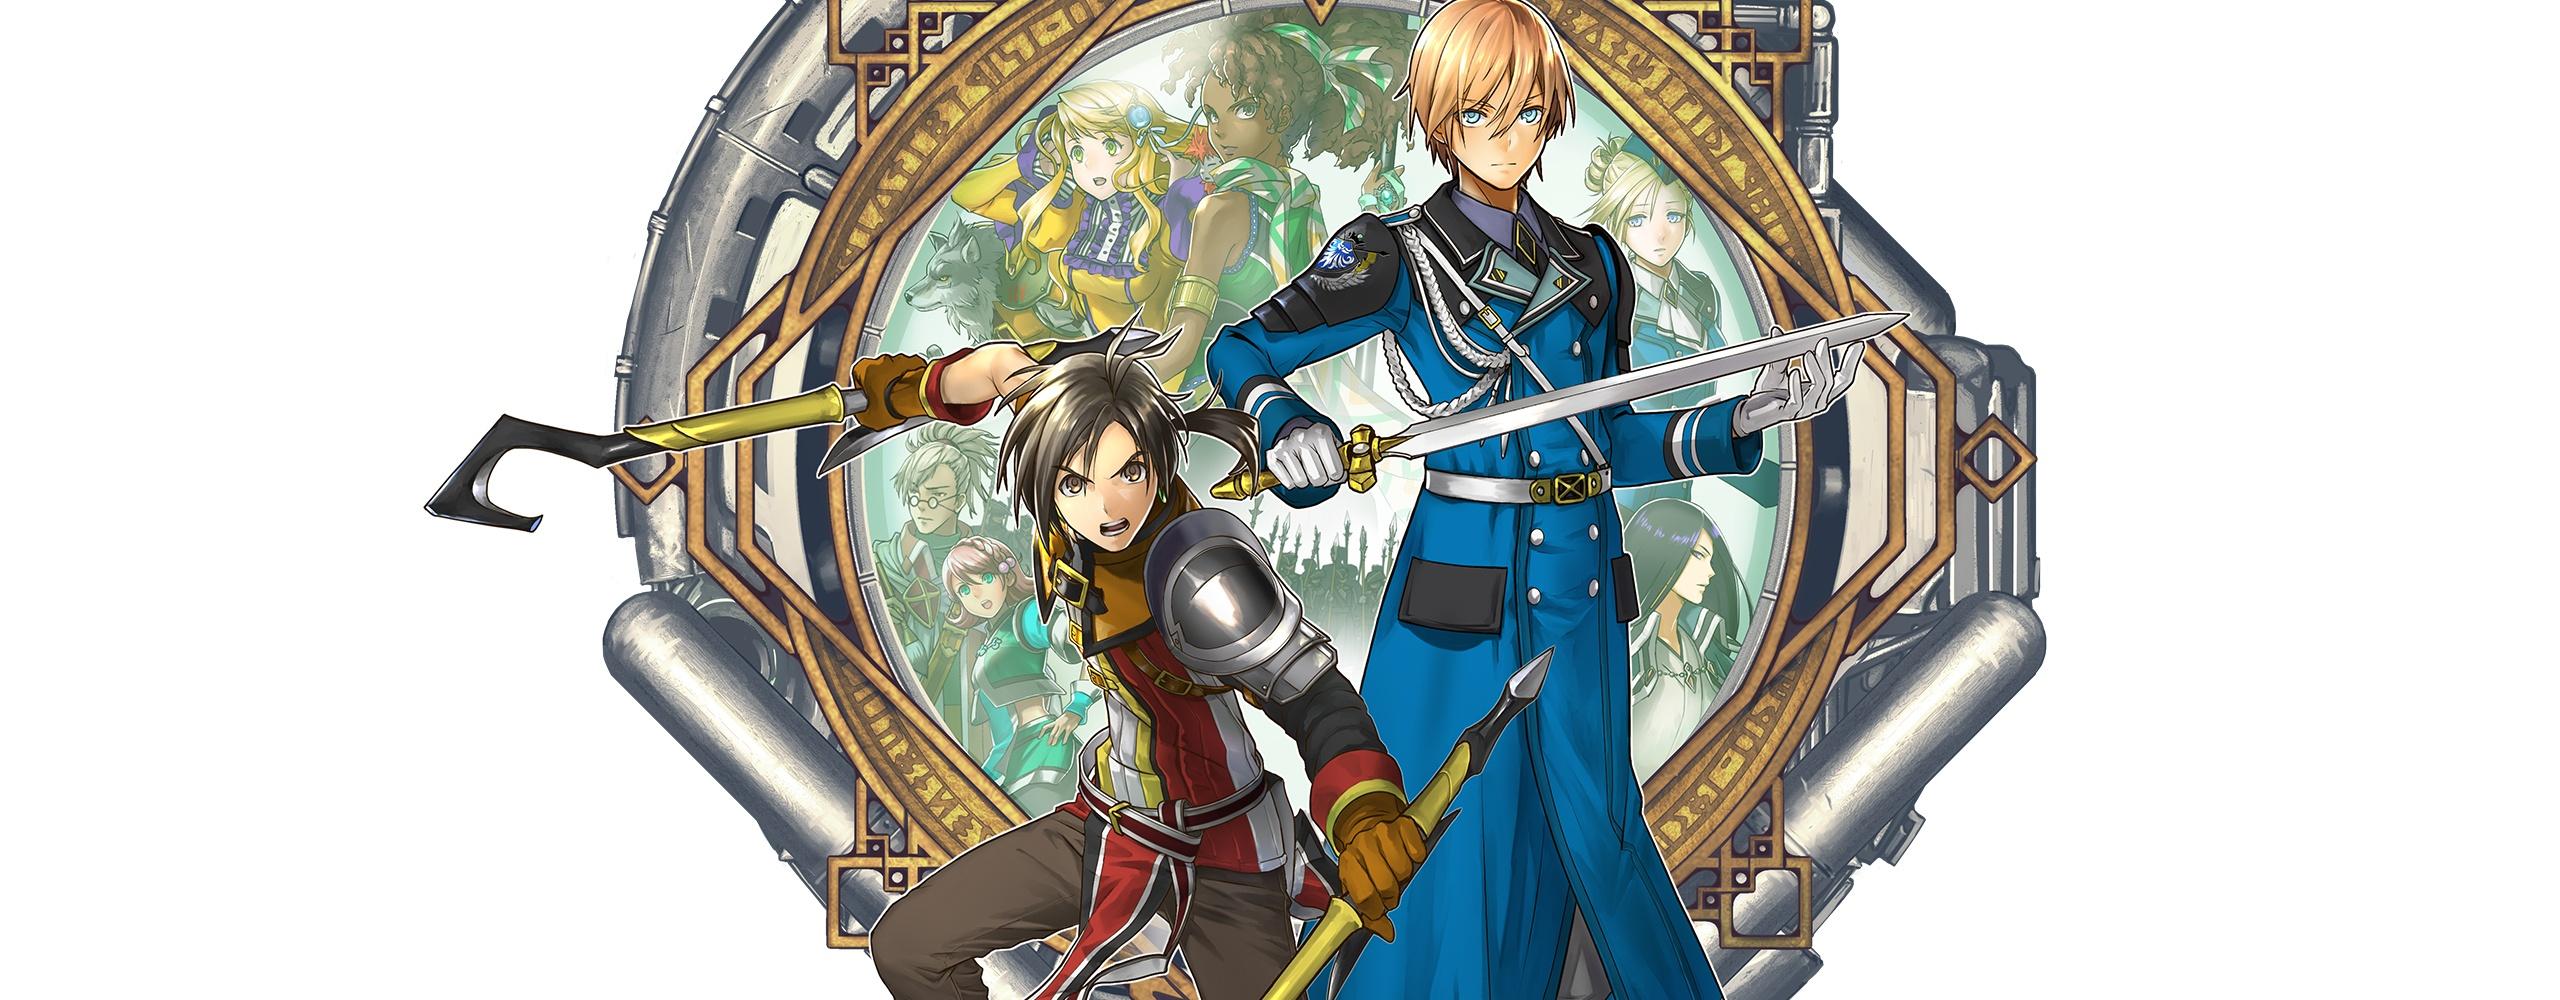 505 Games to publish Eiyuden Chronicle: Hundred Heroes